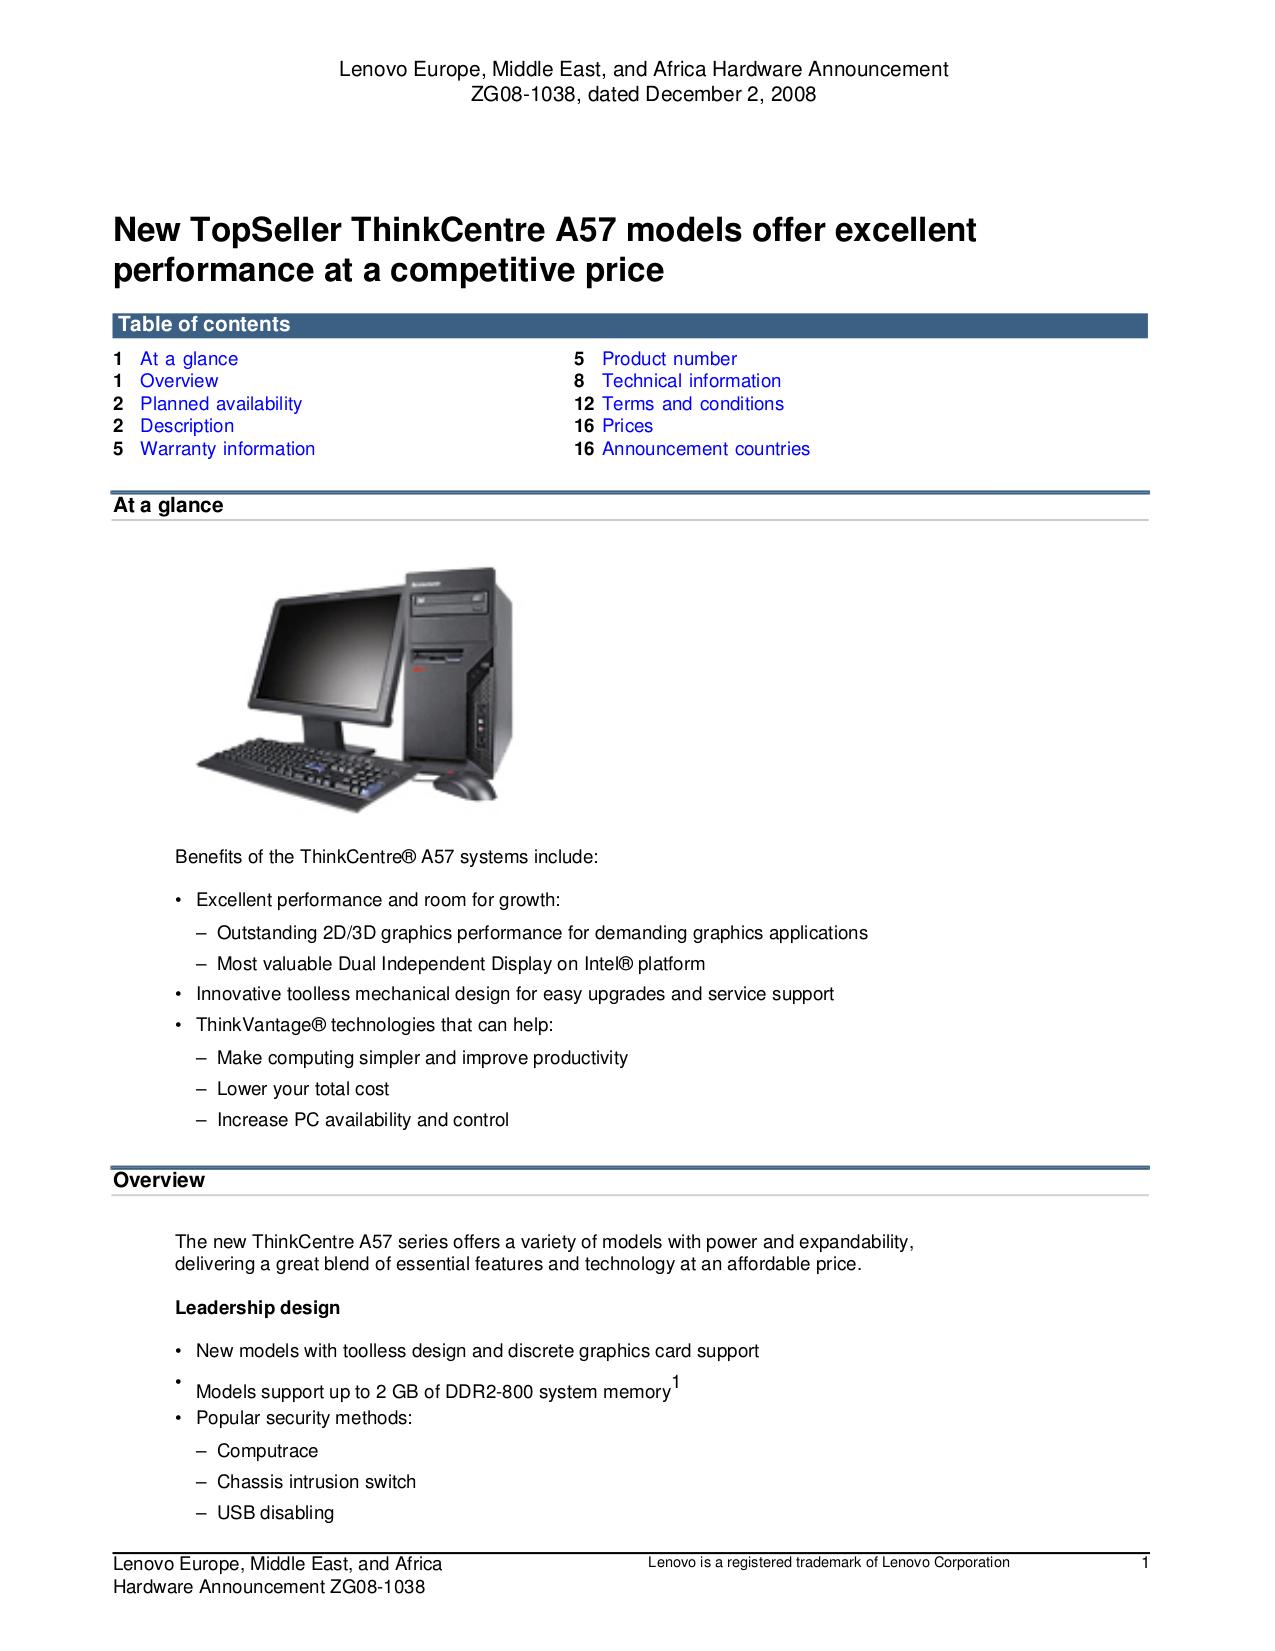 pdf for Lenovo Desktop ThinkCentre A57 9859 manual